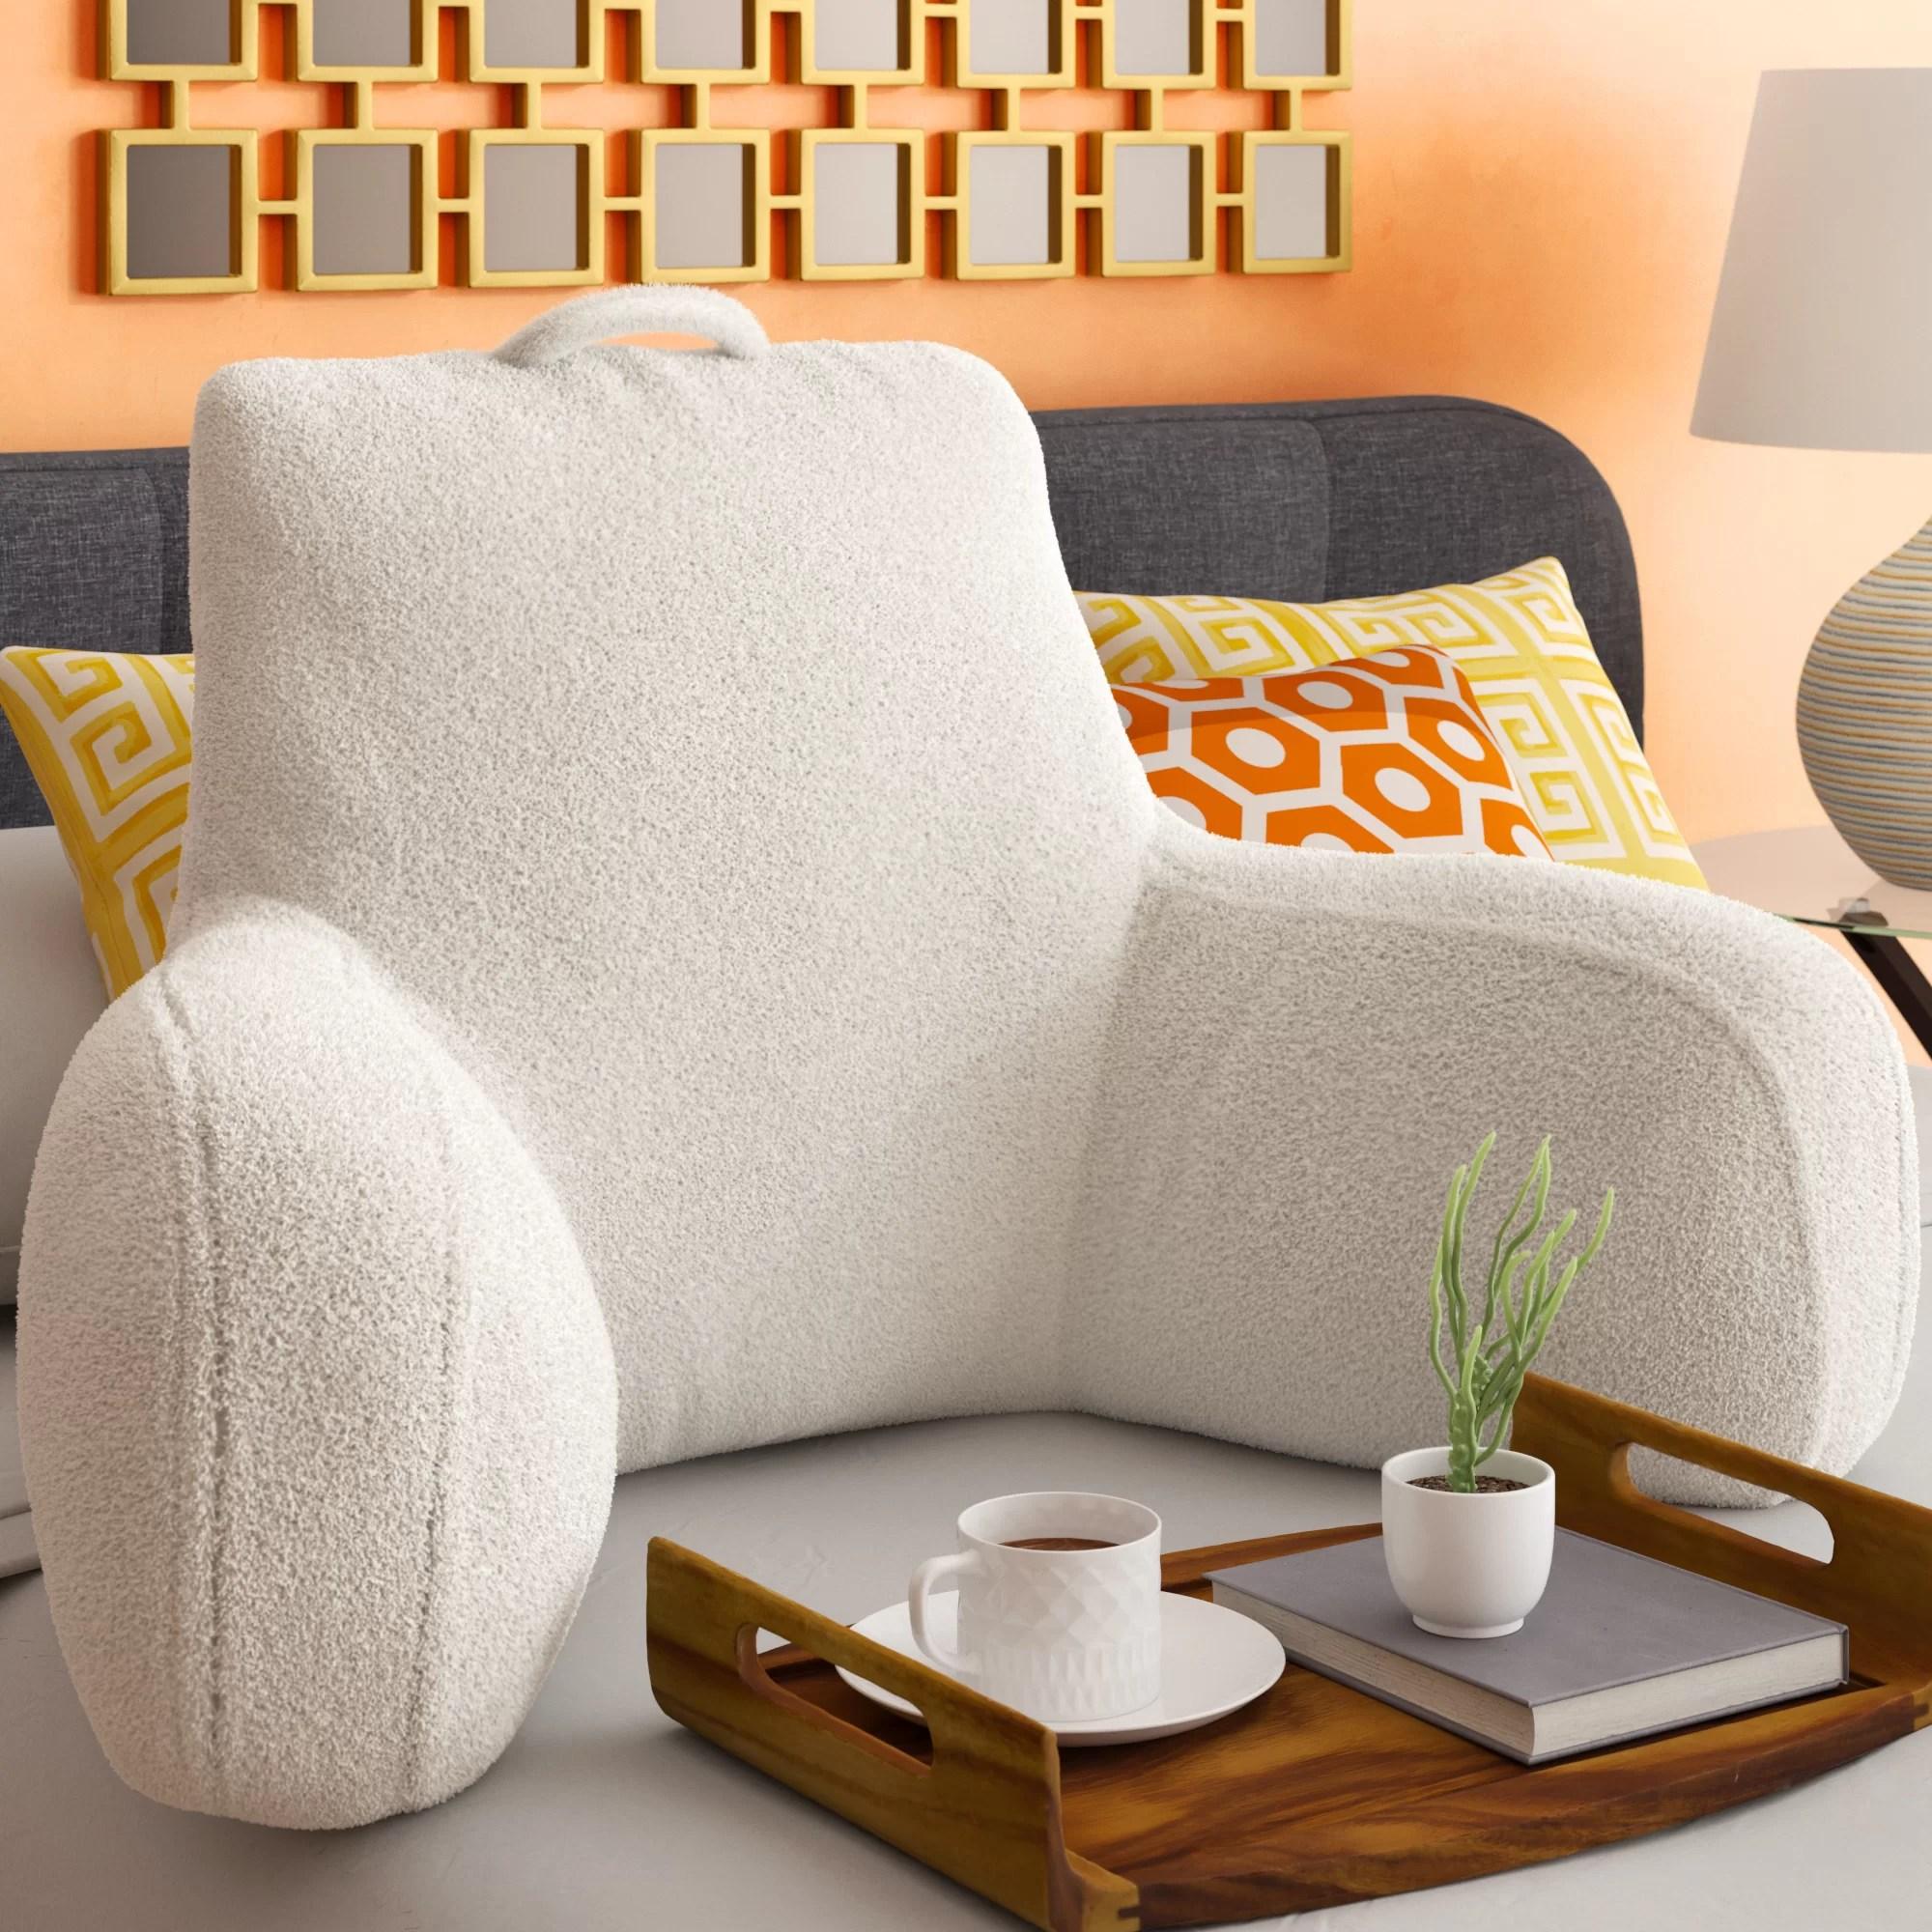 griffing backrest pillow cover insert